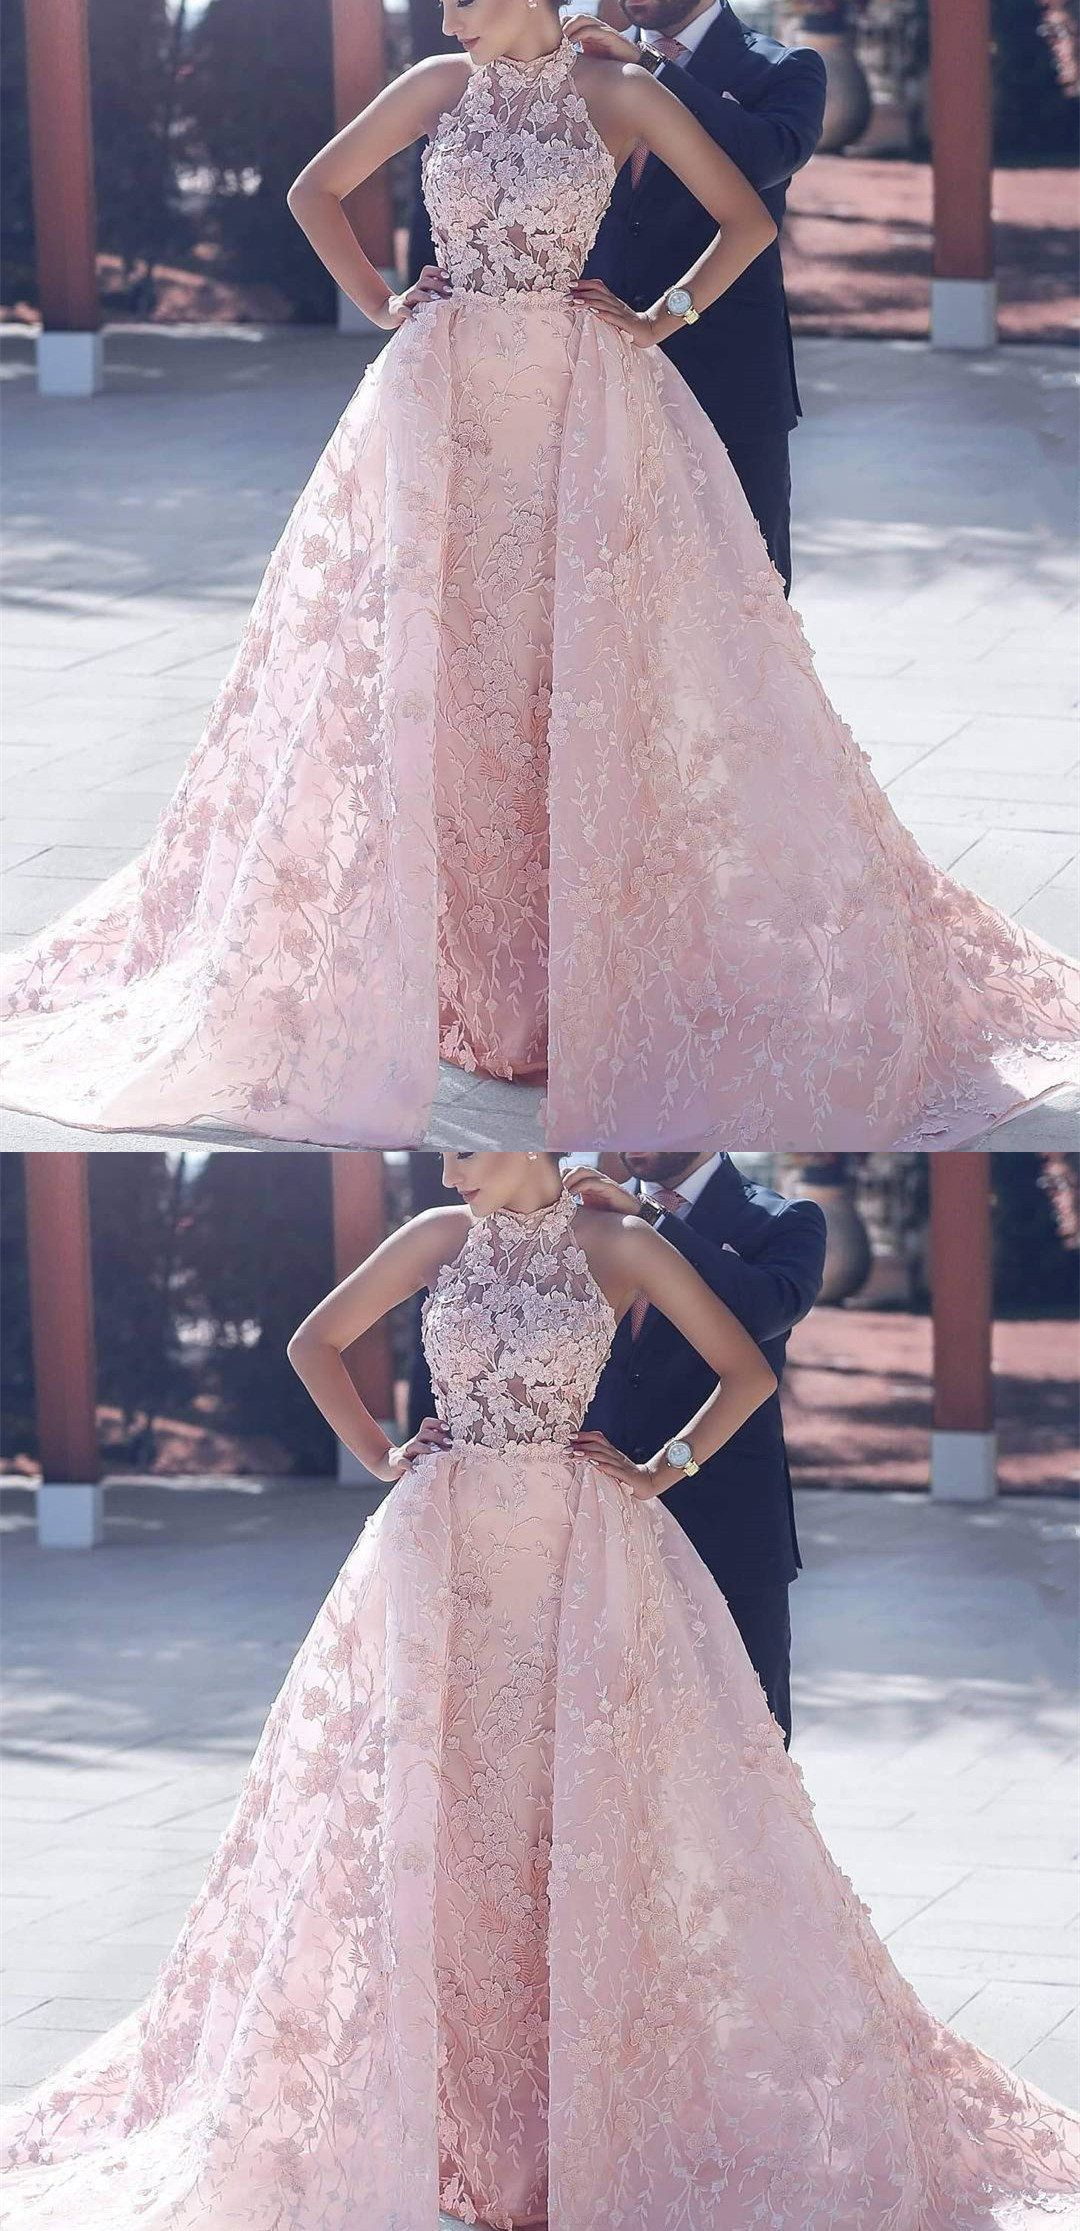 Princess wedding dresses pink prom dresses long prom dresses with